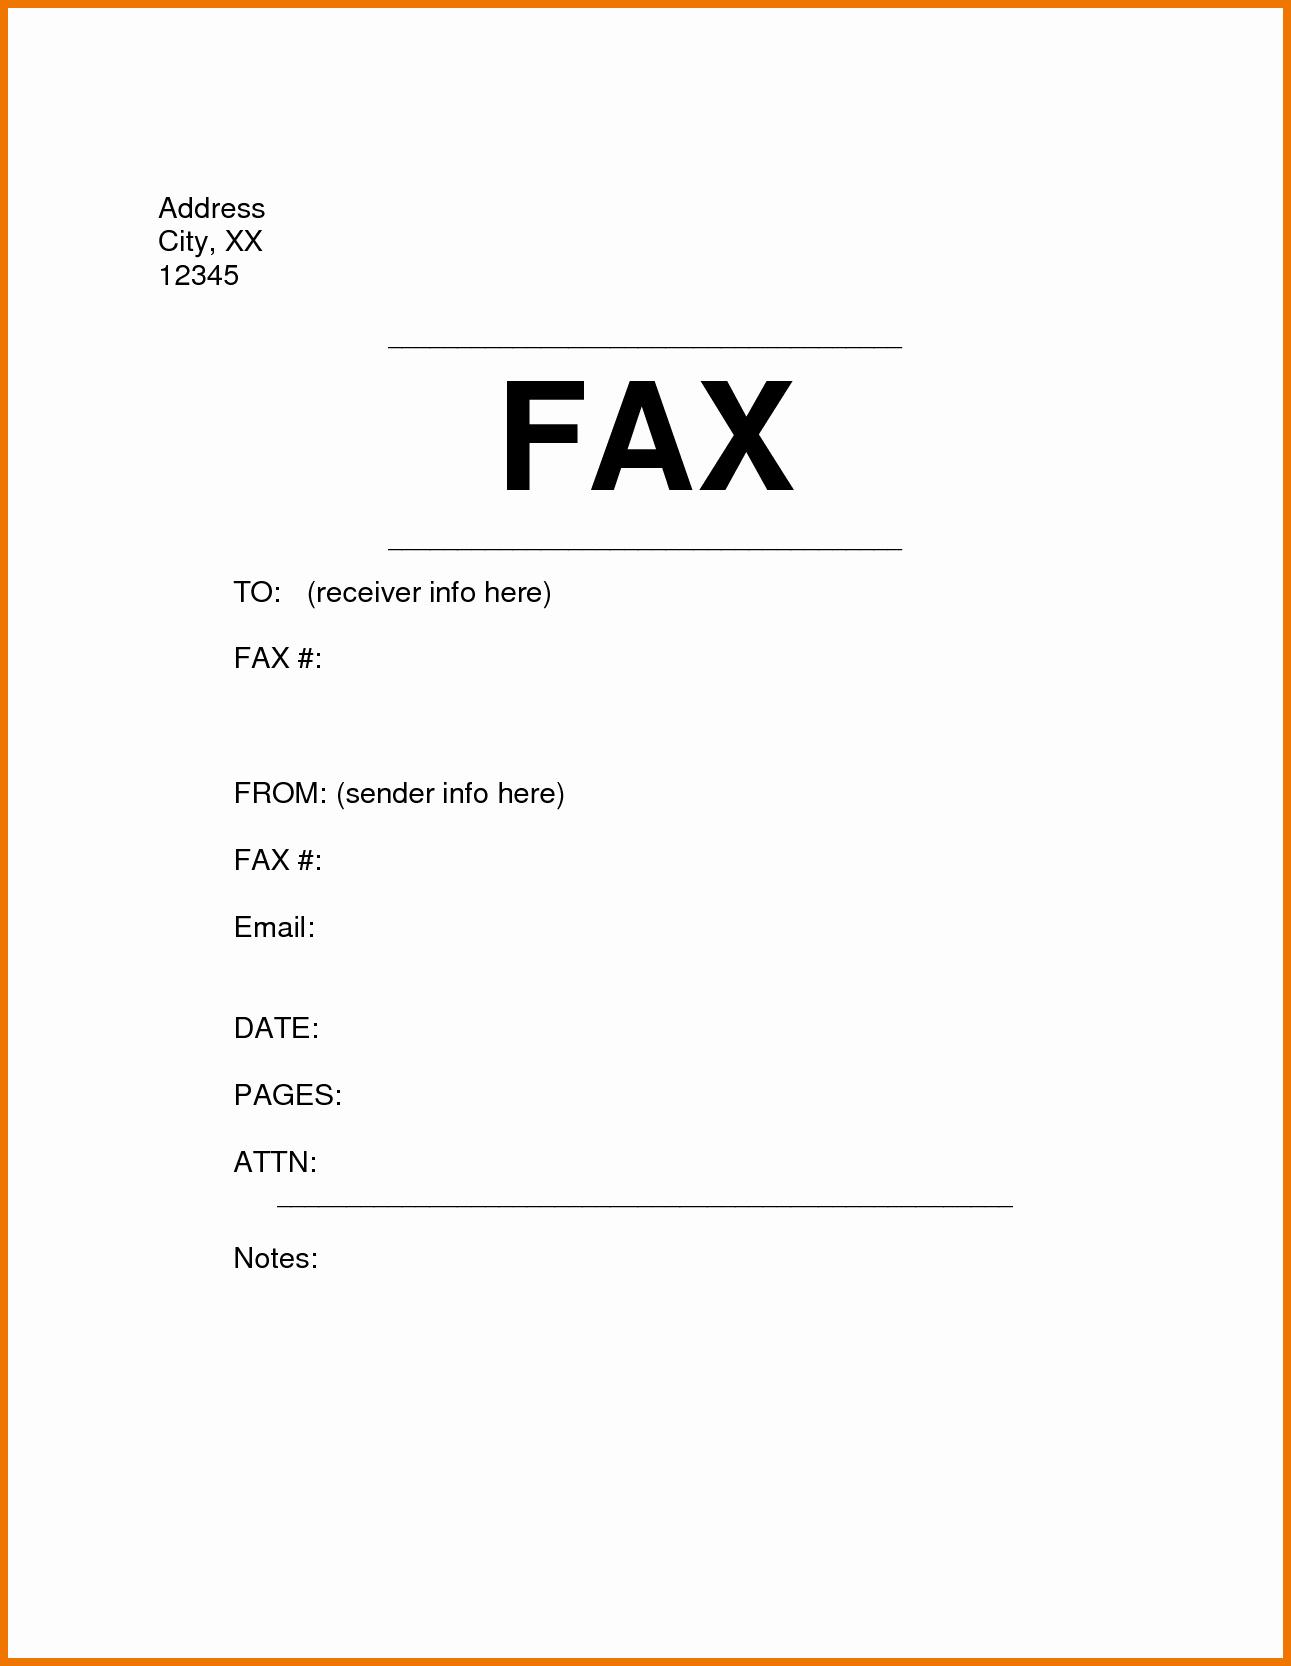 Sample Fax Cover Sheet Staruptalent